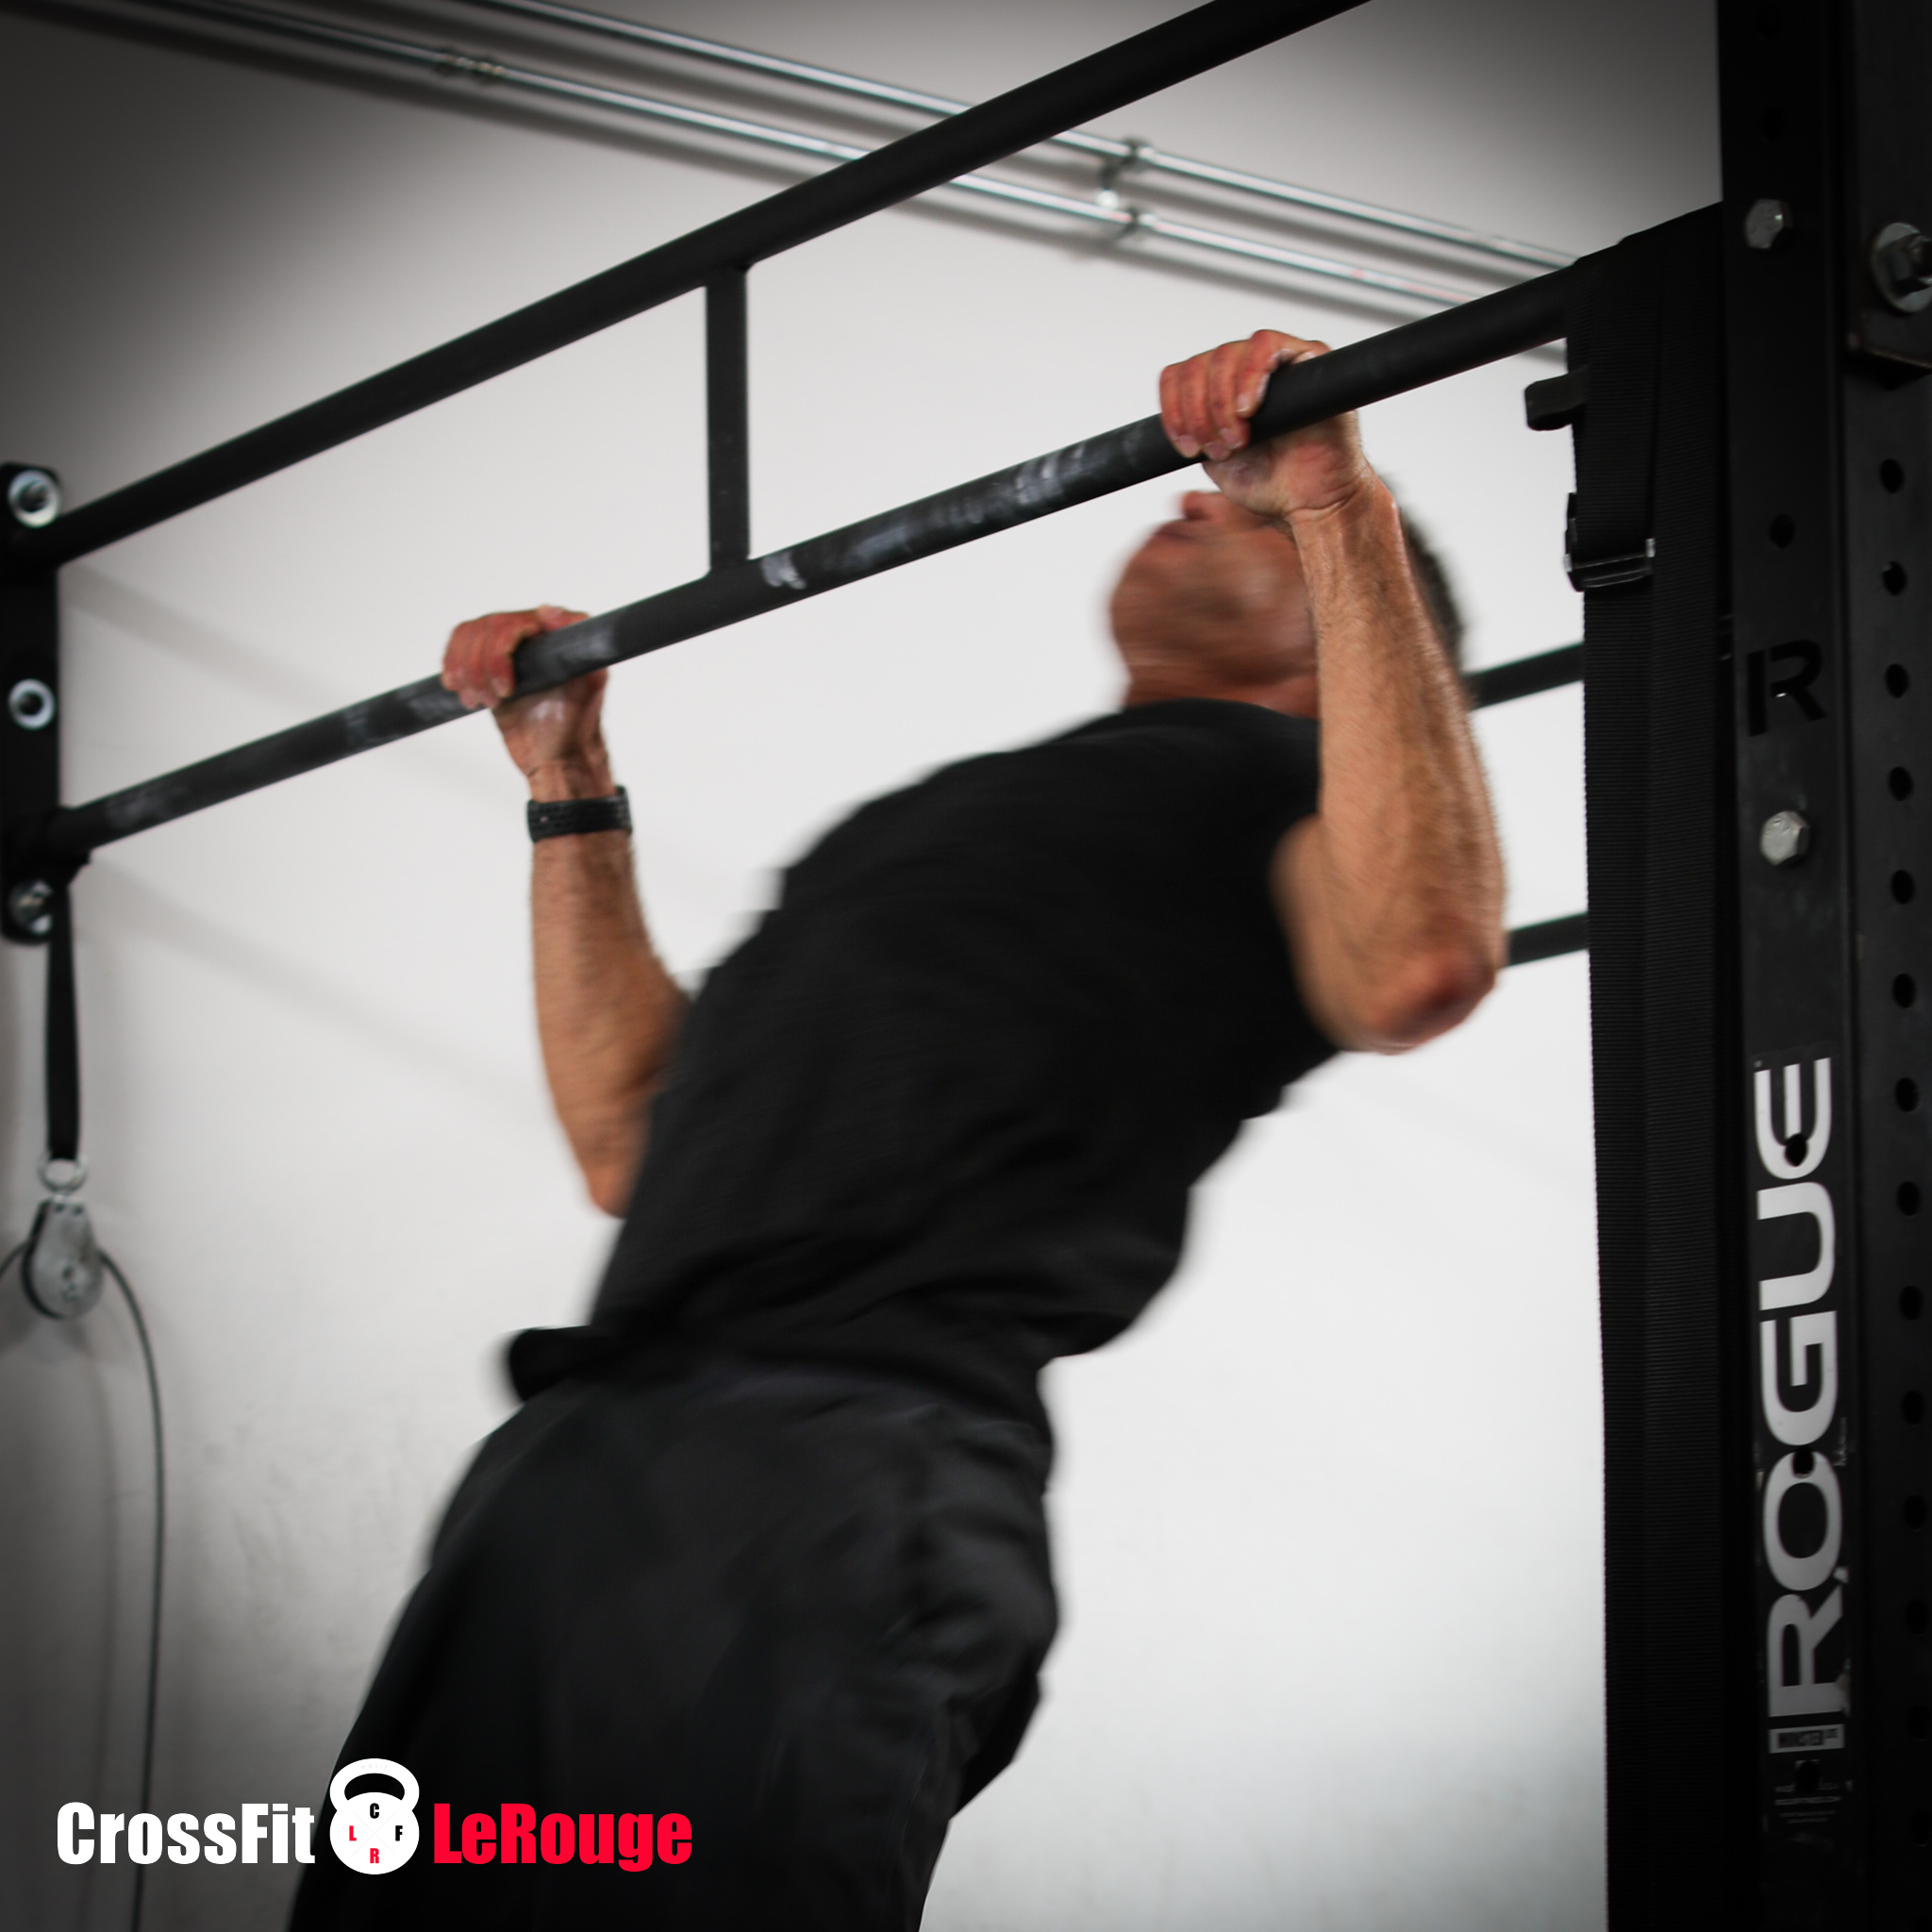 CrossFit WOD Fran thruster pull-ups